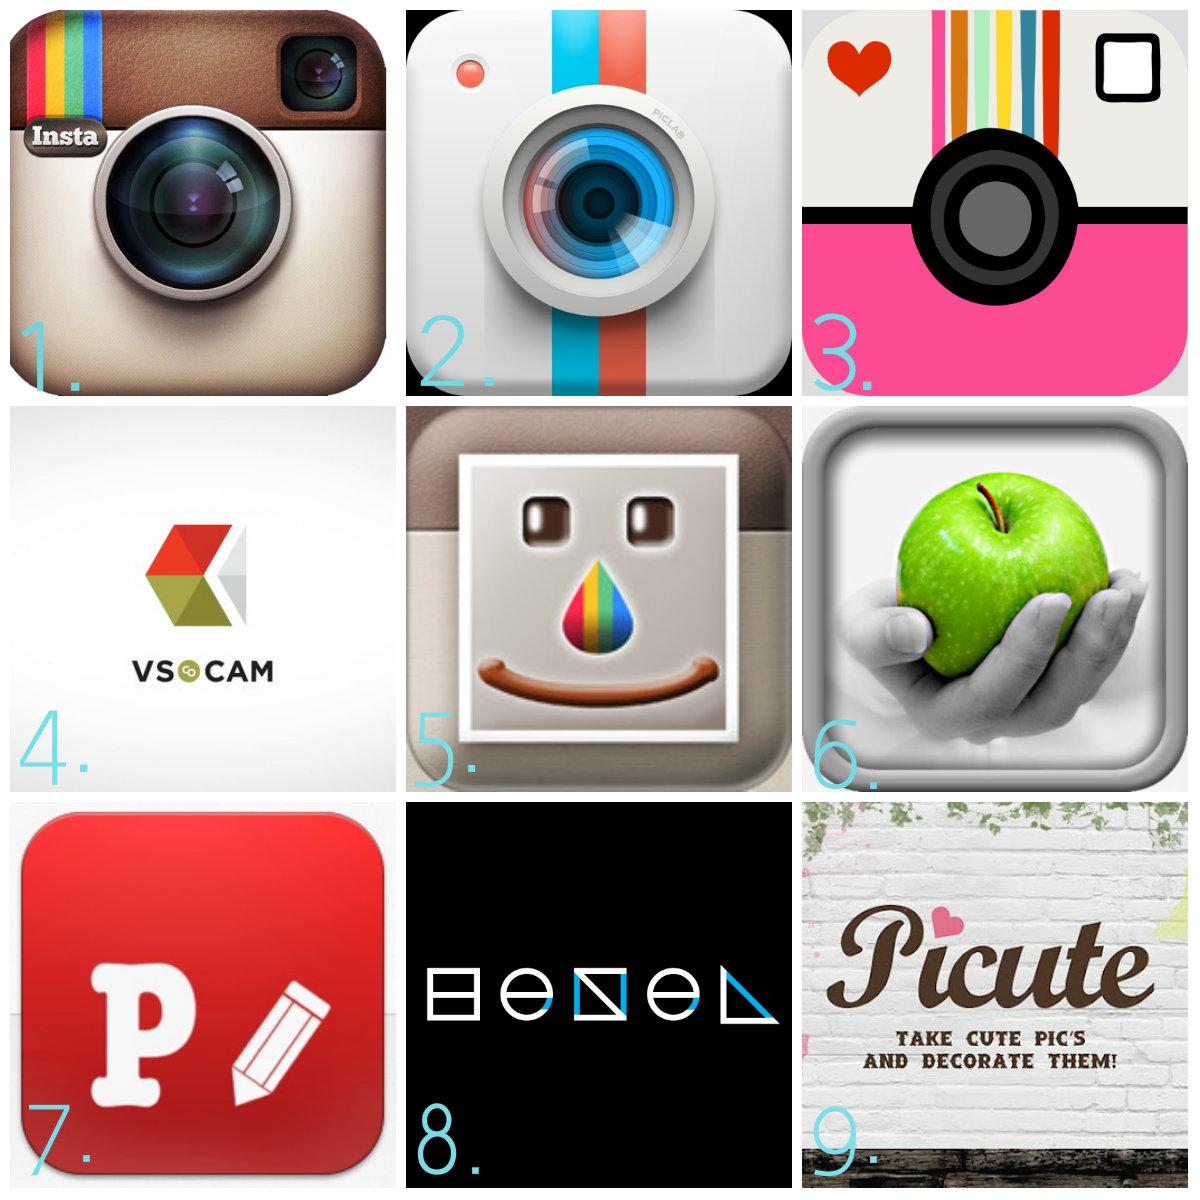 aplicaciones para editar fotos imagui